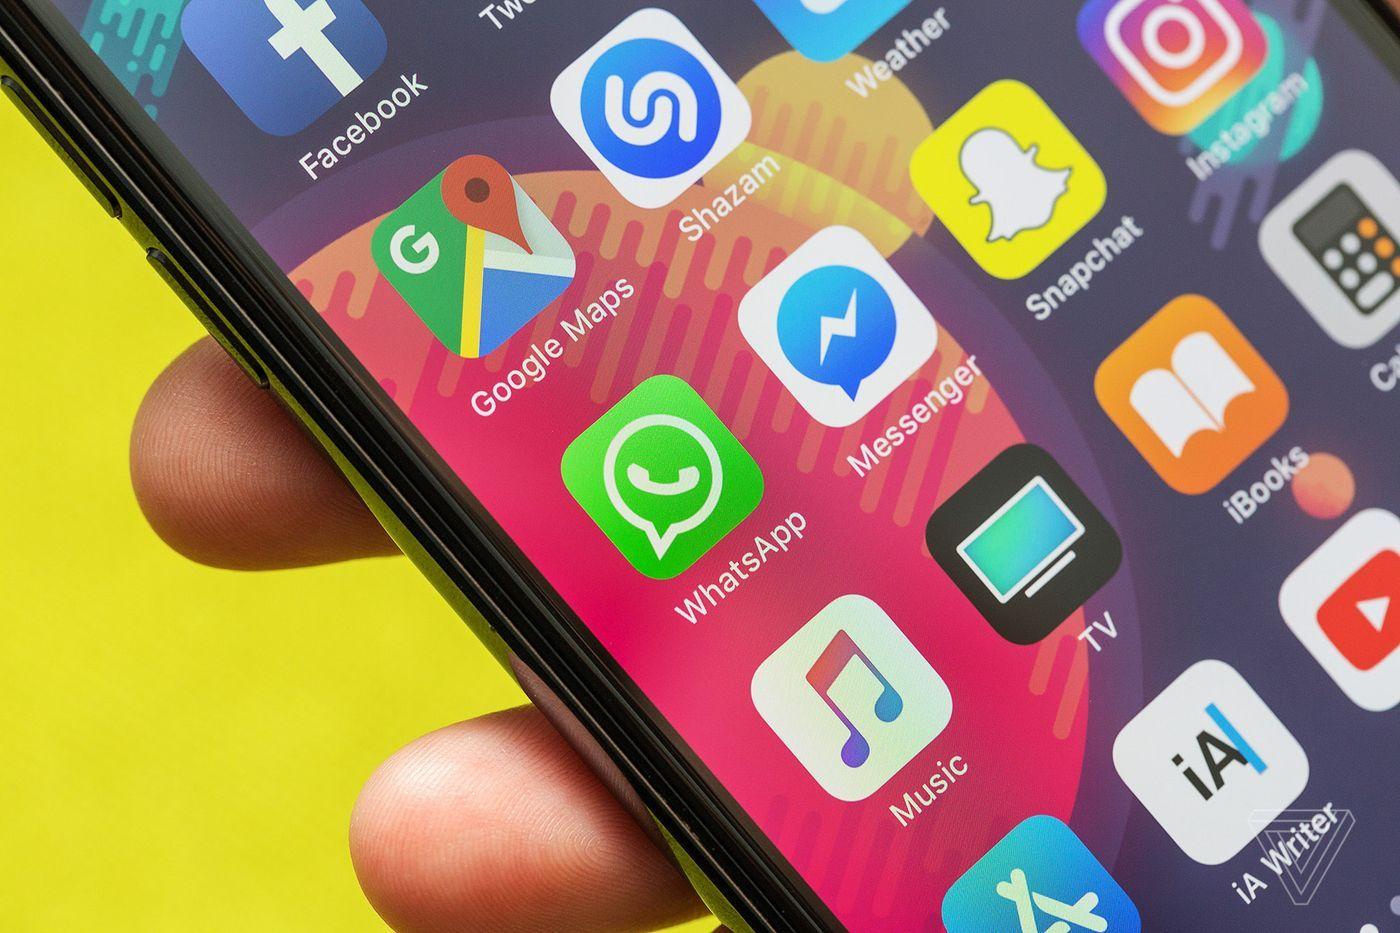 WhatsApp cofounder tells everyone to delete Facebook